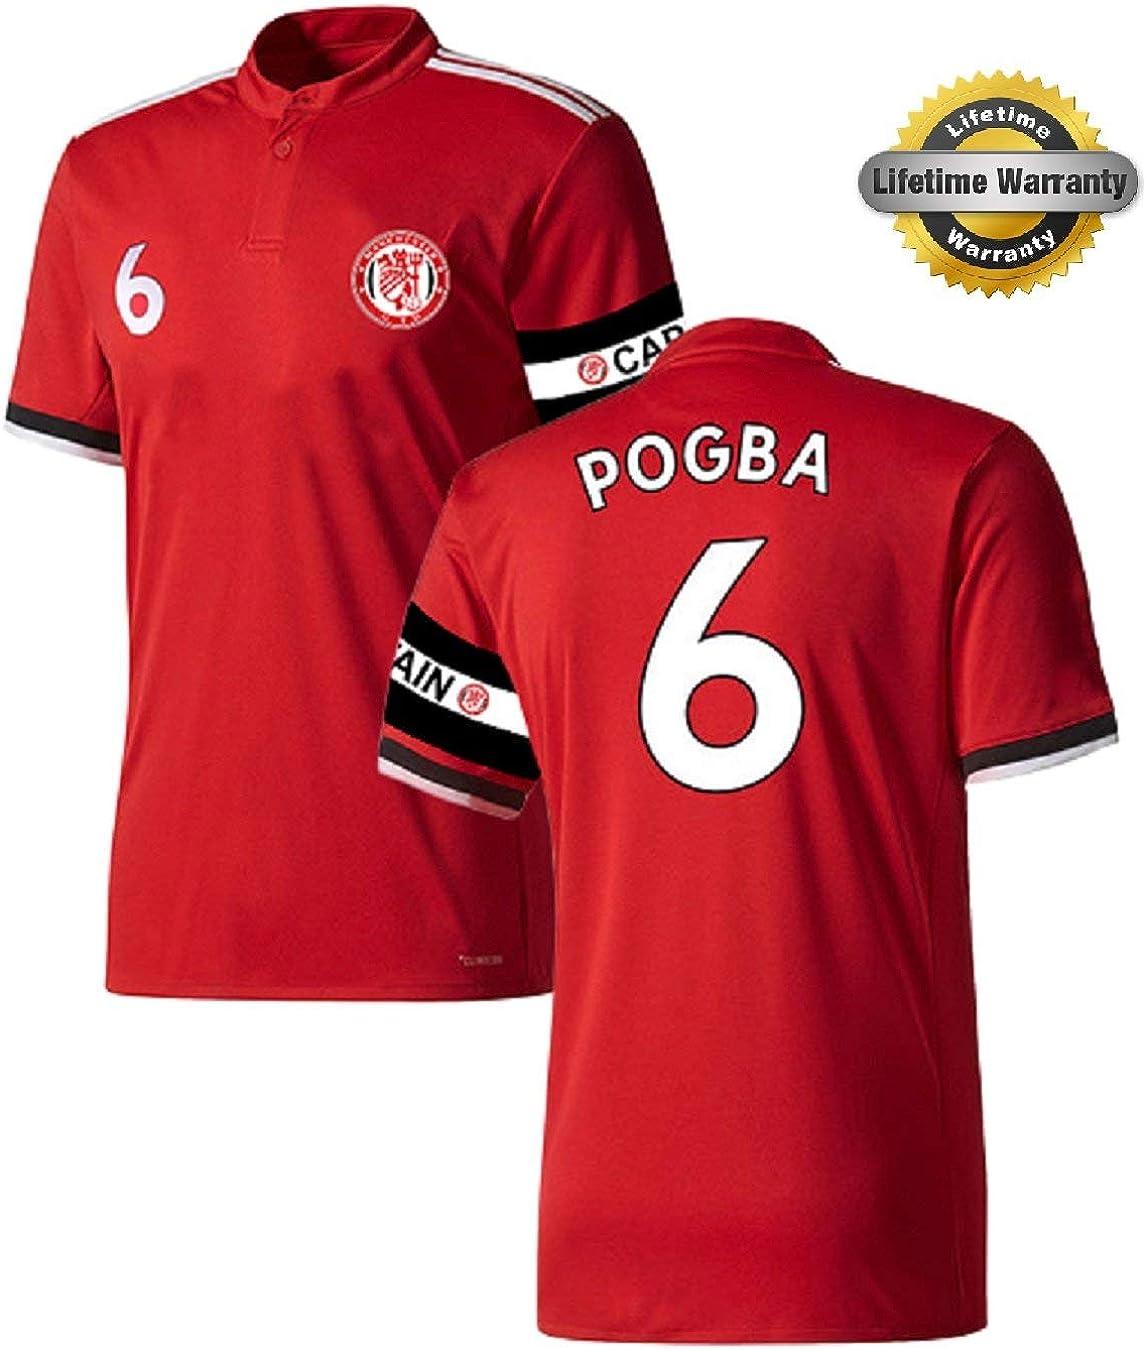 Pogba Jersey Youth #6 Kids Soccer Jersey Shorts Gift = Premium Gift Kids Boys Girls Football Paul Pogba 6